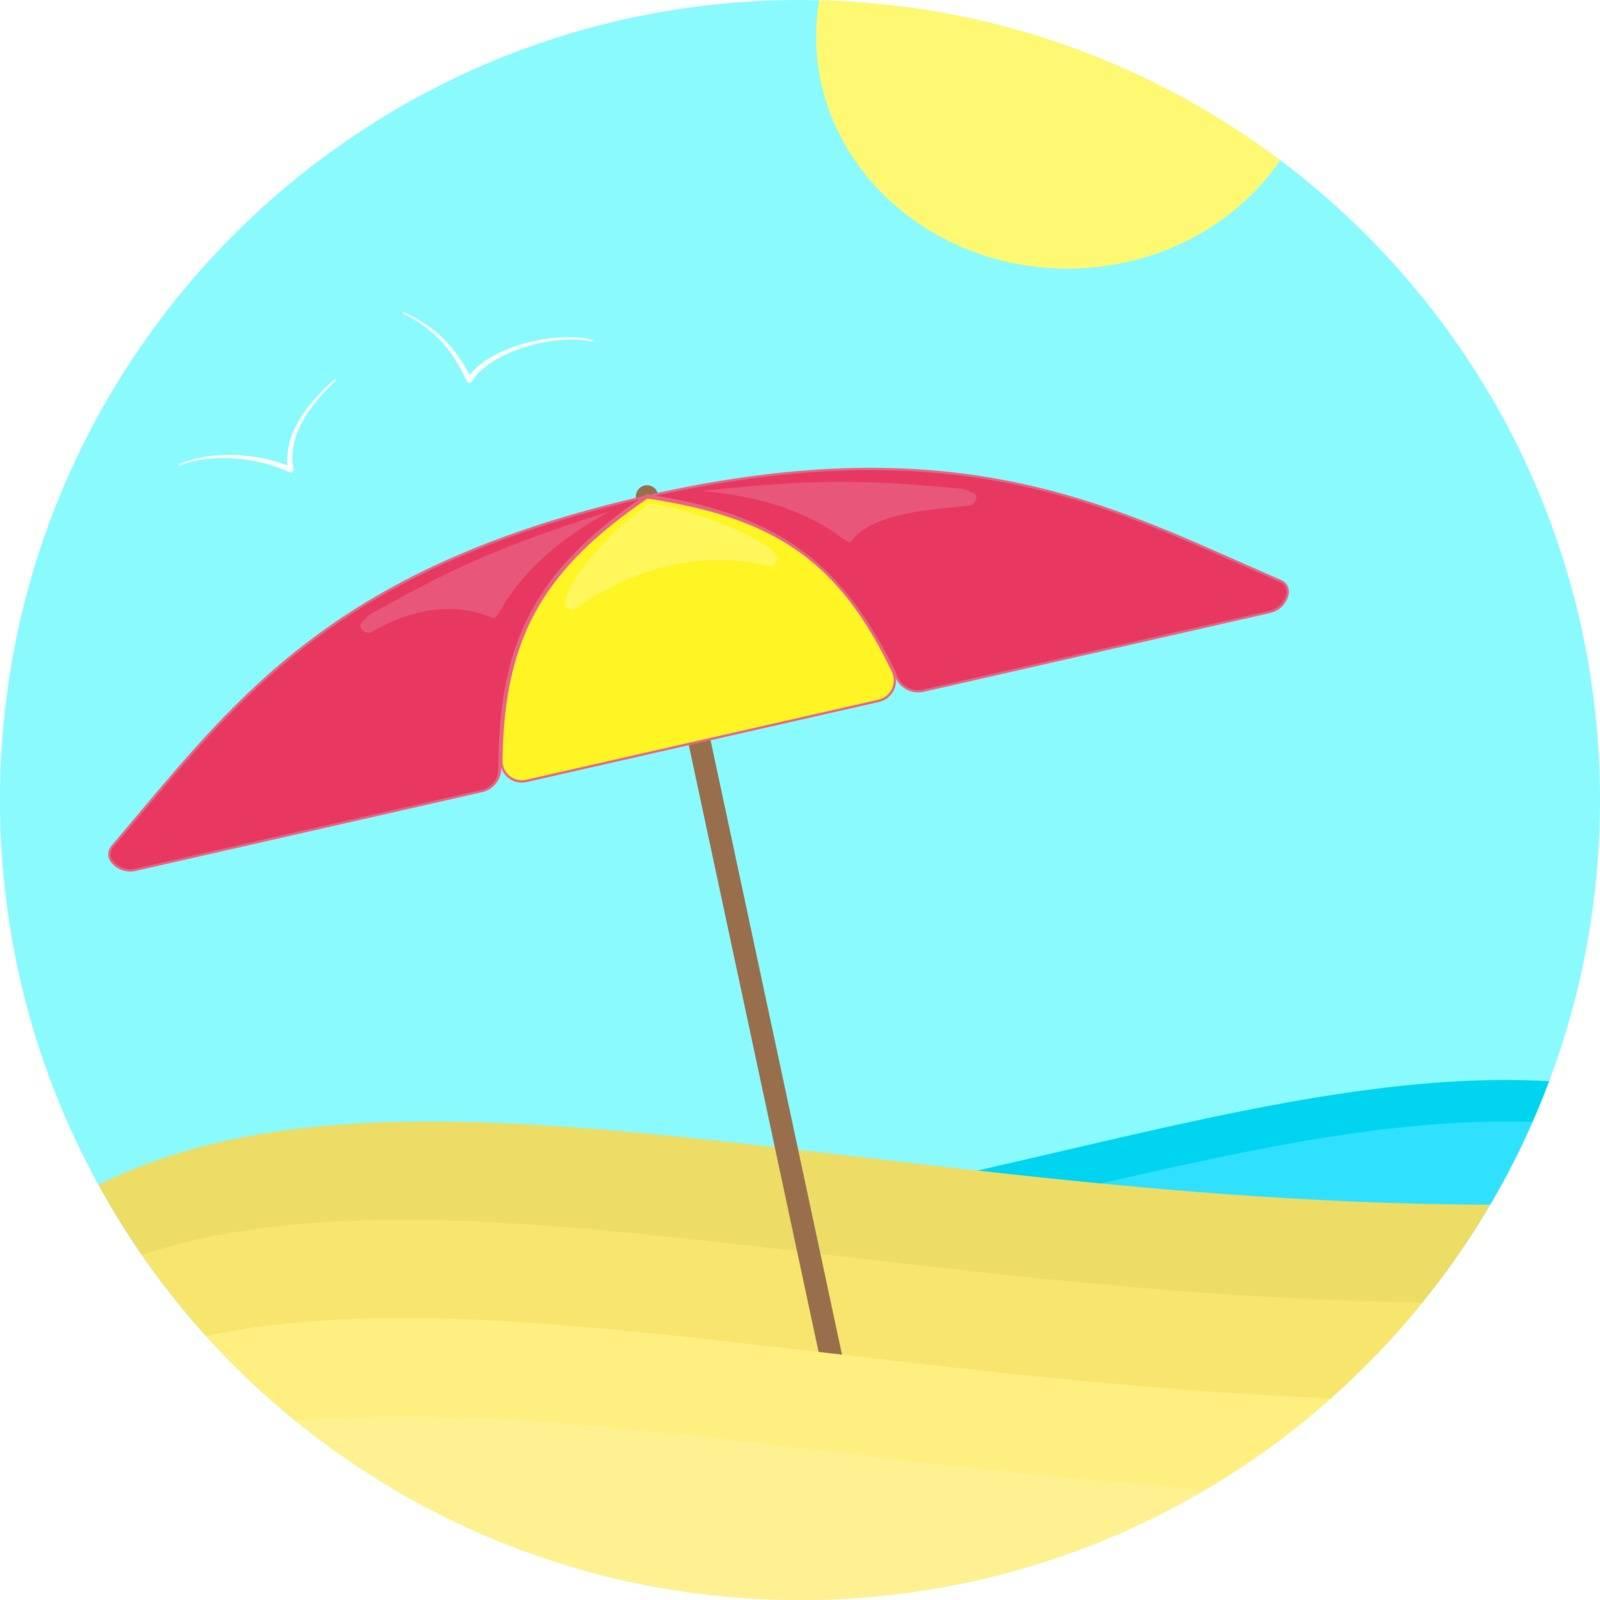 Colorful flat summer sun umbrella on the sea beach